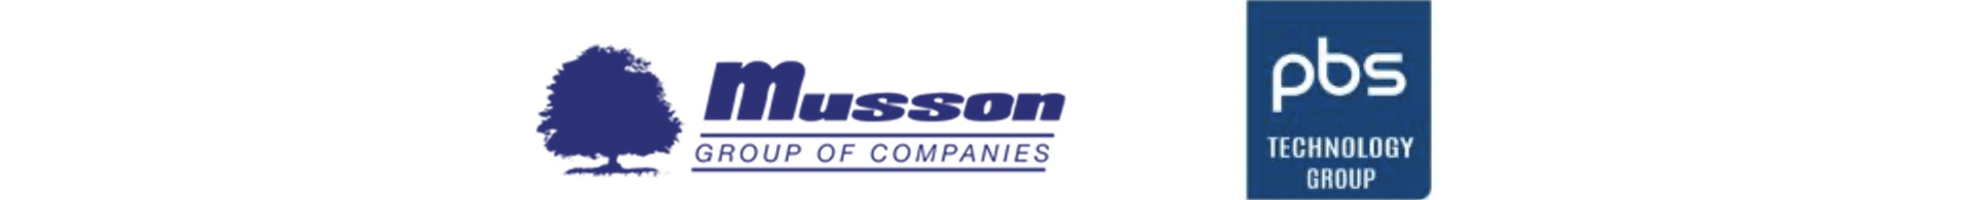 Musson & PBS logo